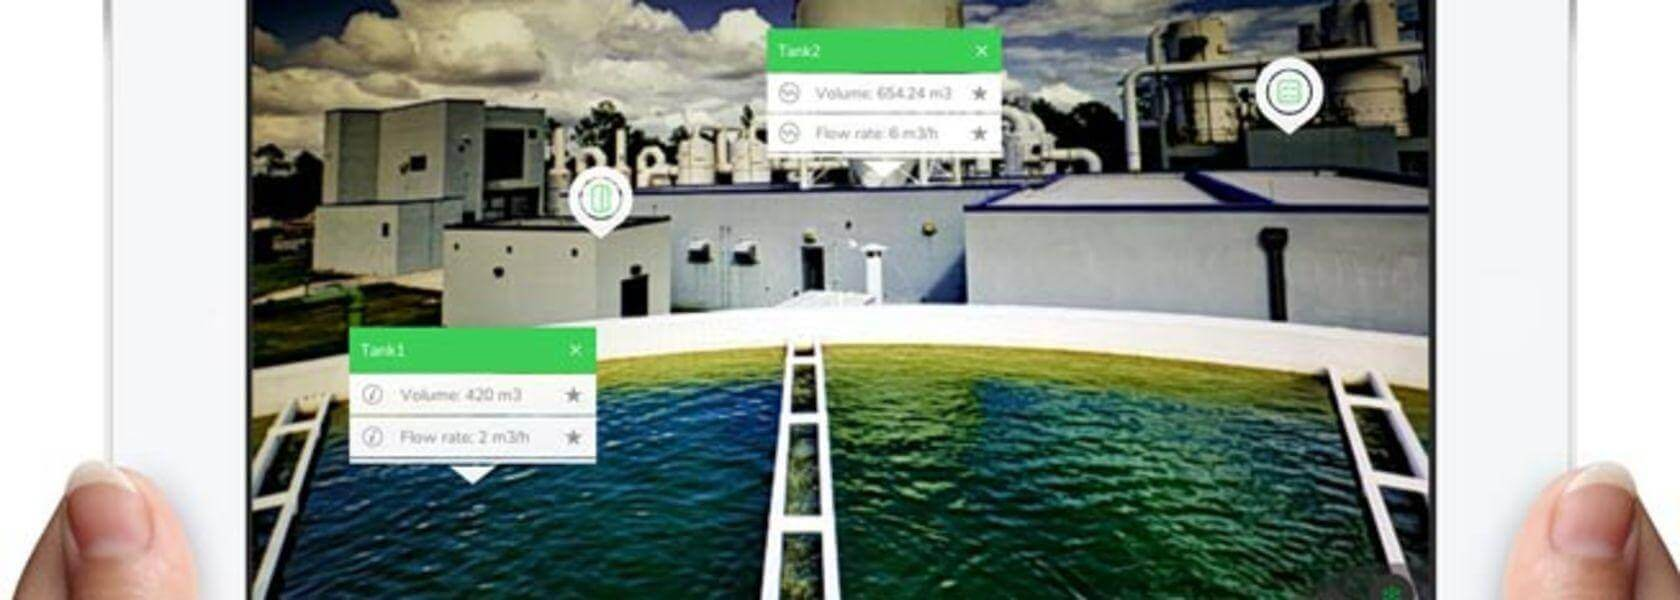 EcoStruxure Augmented Operator Advisor by Schneider Electric